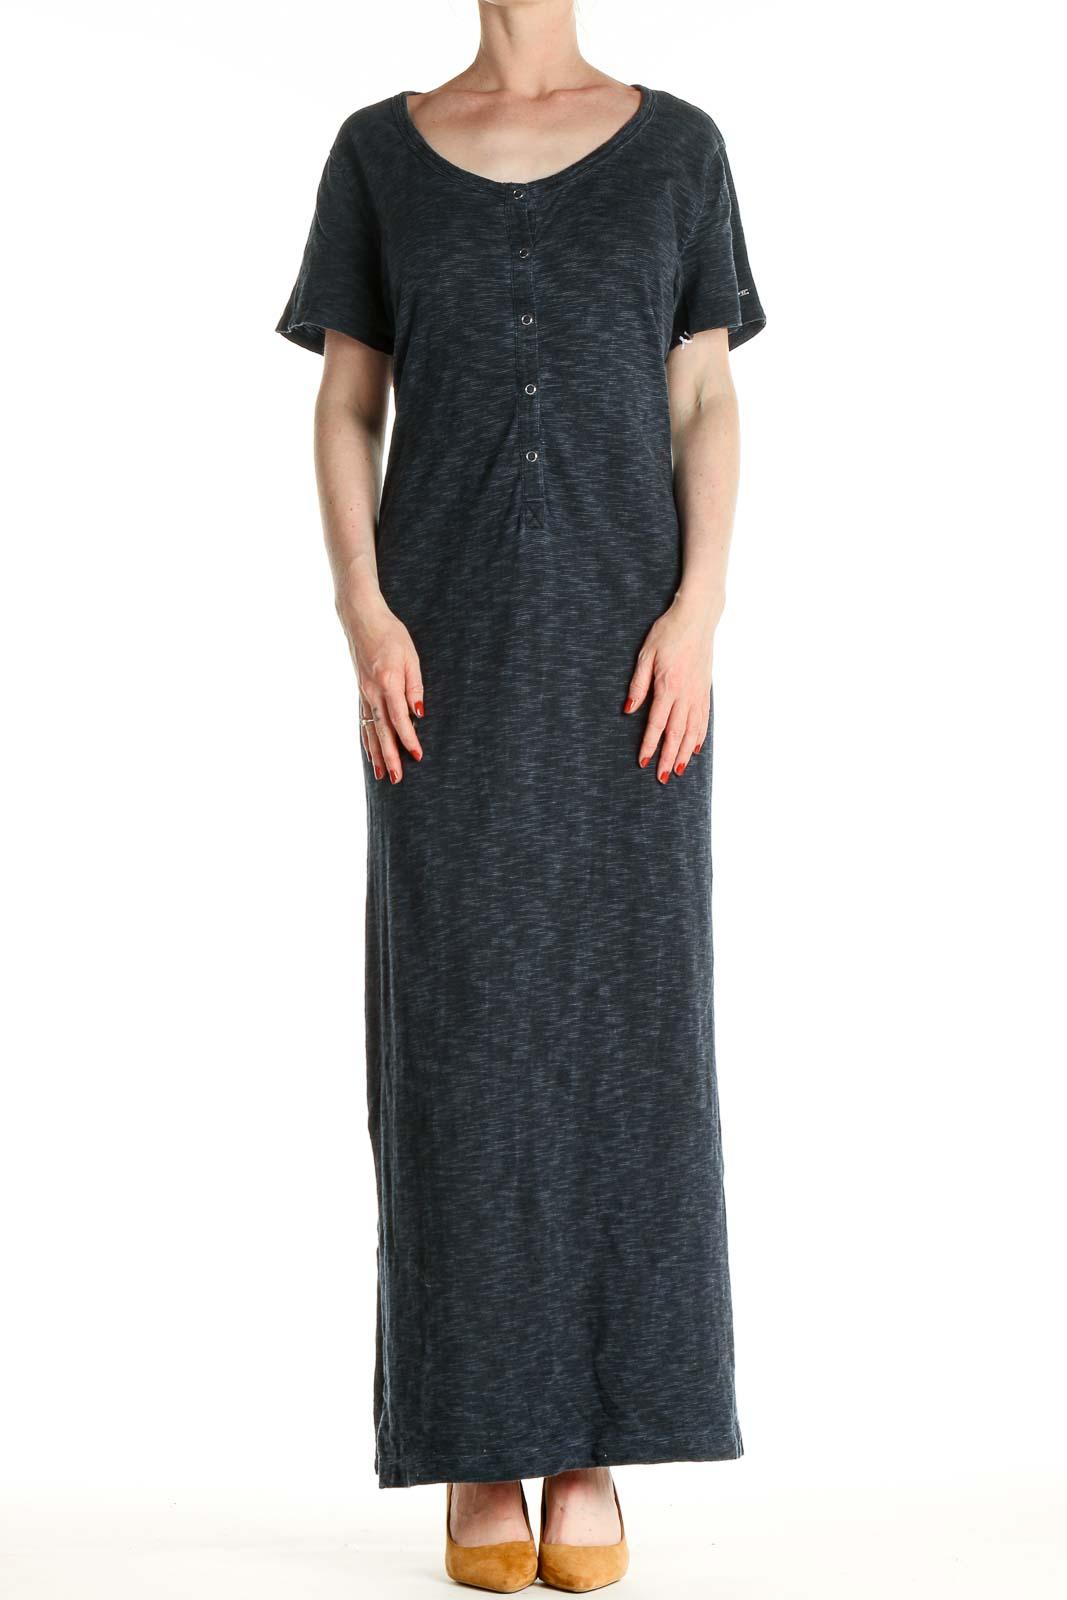 Gray Classic Column Dress Front